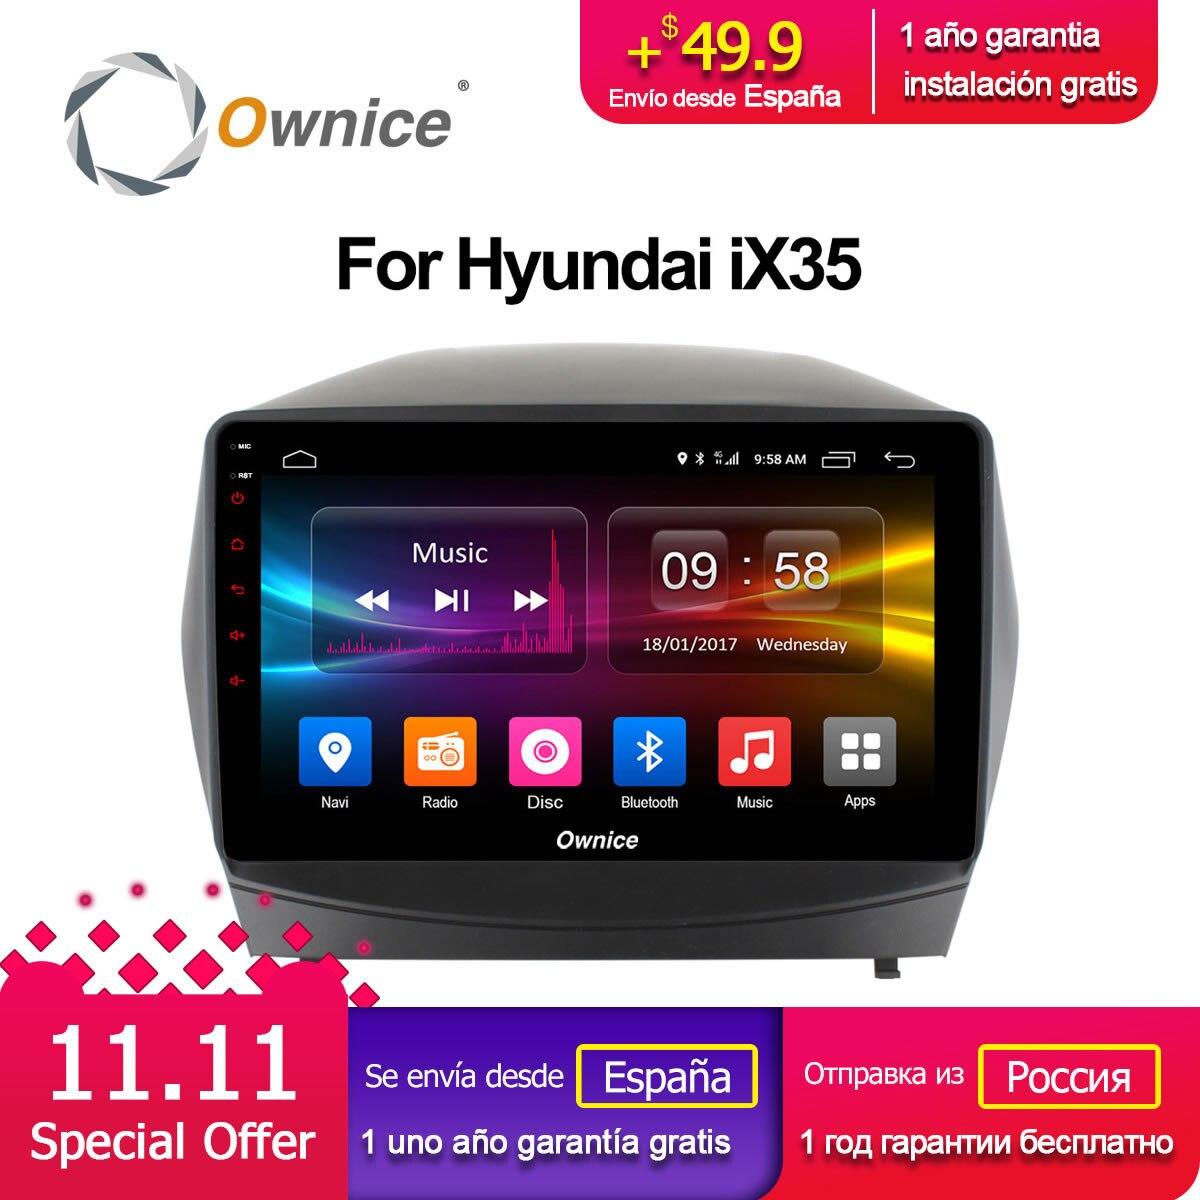 Ownice C500 + G10 Octa Huit Core Android 8.1 autoradio lecteur DVD GPS pour Hyundai iX35 2010-2015 2g RAM 32g ROM Soutien 4g LTE